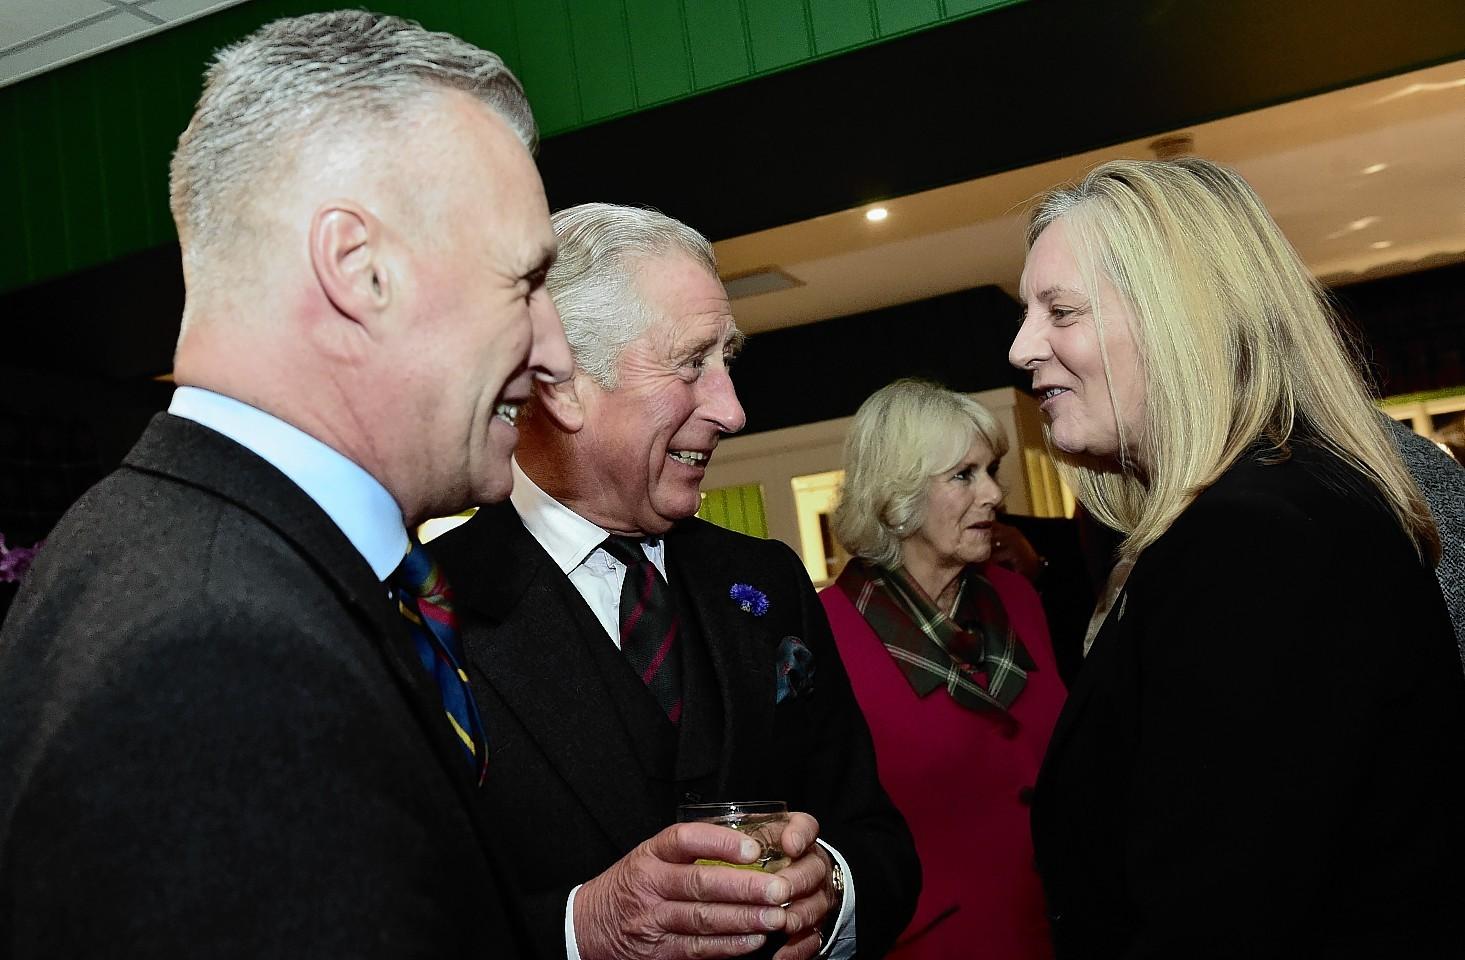 Prince Charles mingles with the crowd. Credit: Kami Thomson.